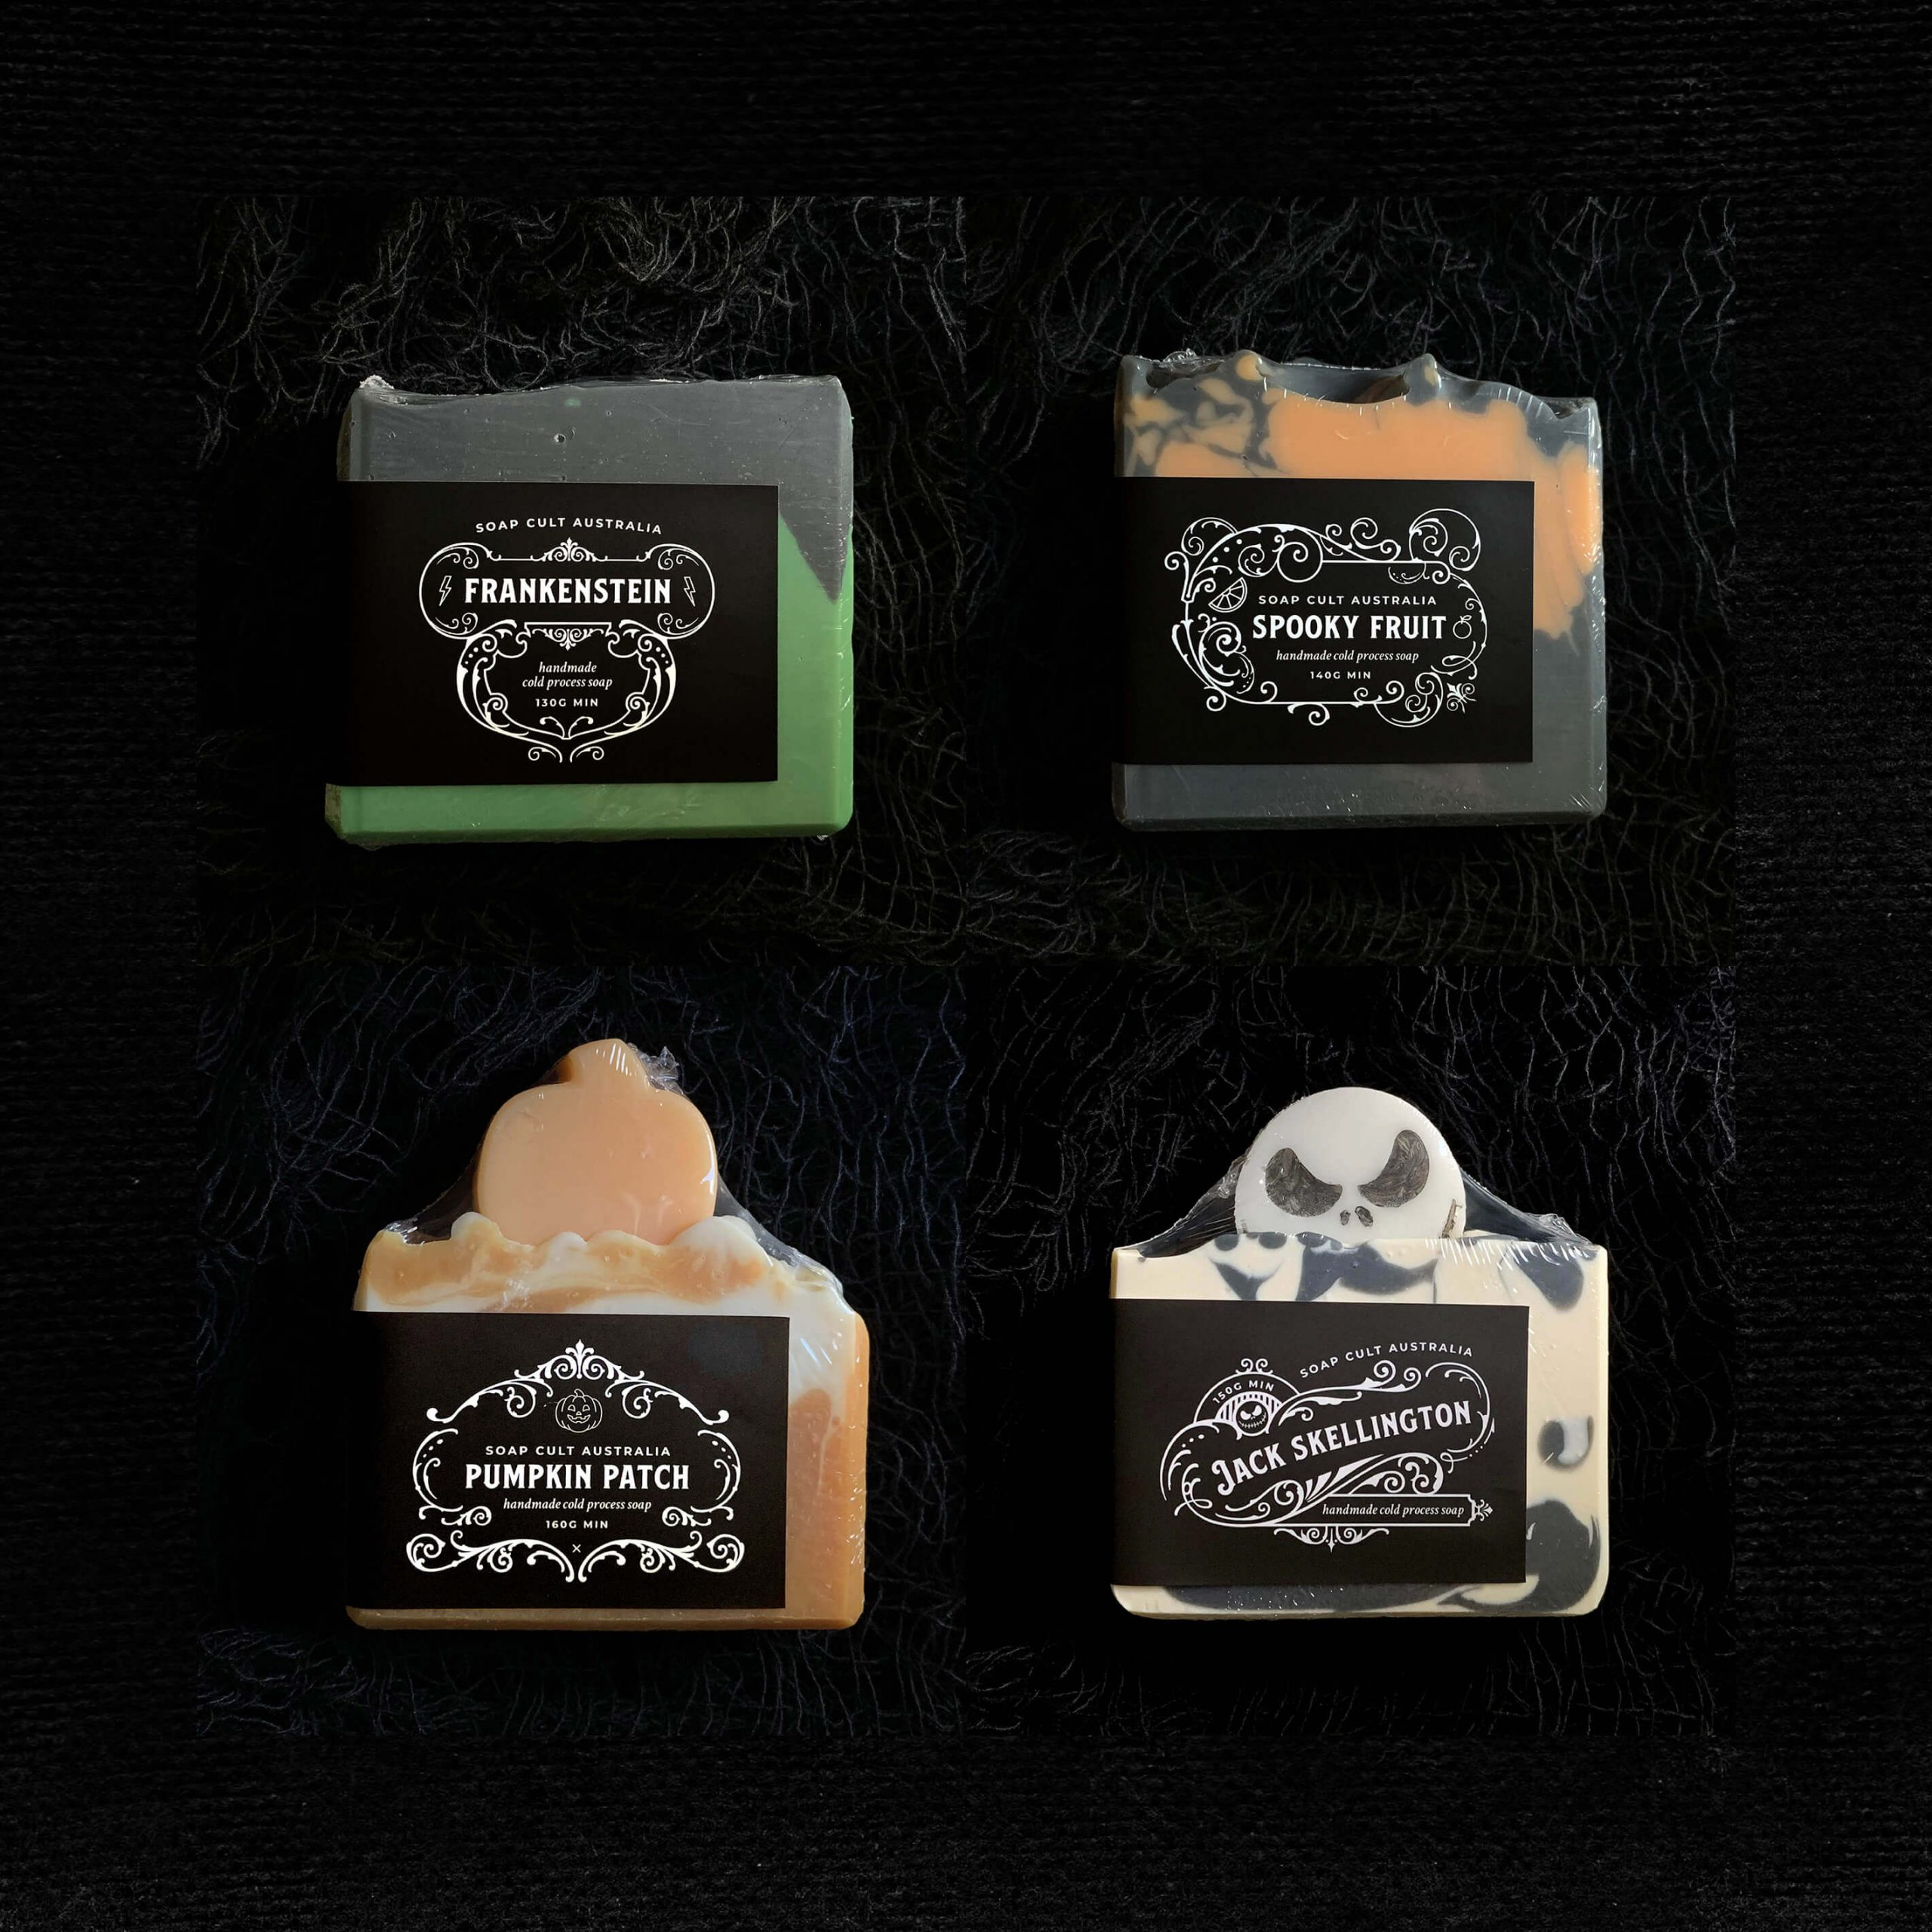 Four Soap Cult Australia soaps showing custom brand labels